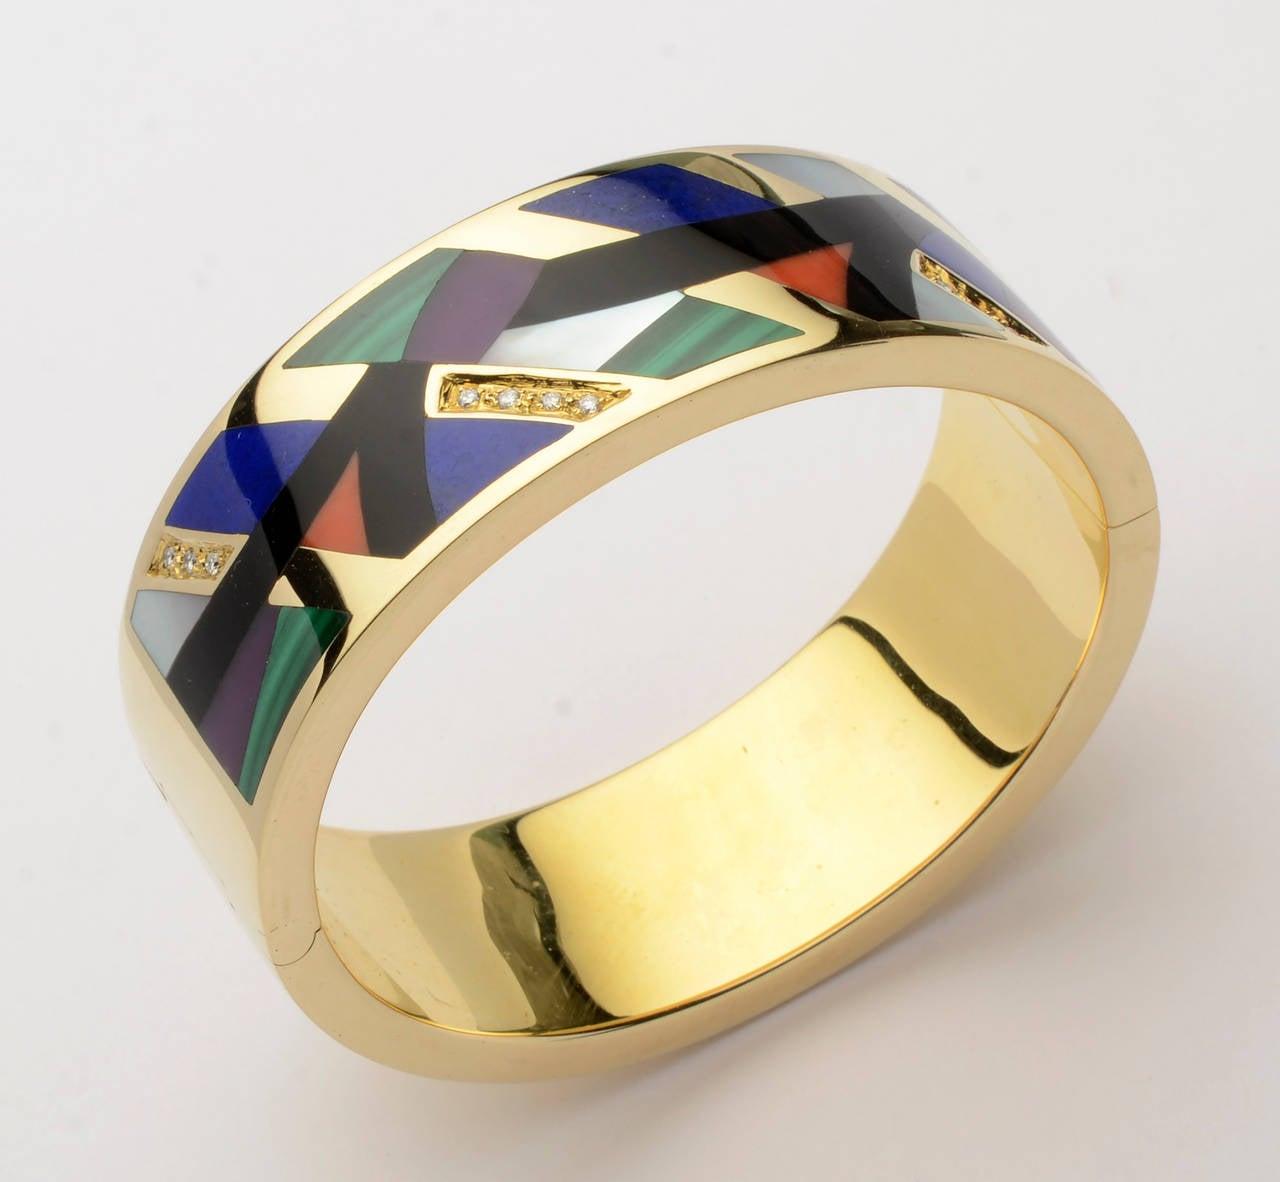 Asch Grossbardt Hinged Inlaid Gemstone Bangle Bracelet 2